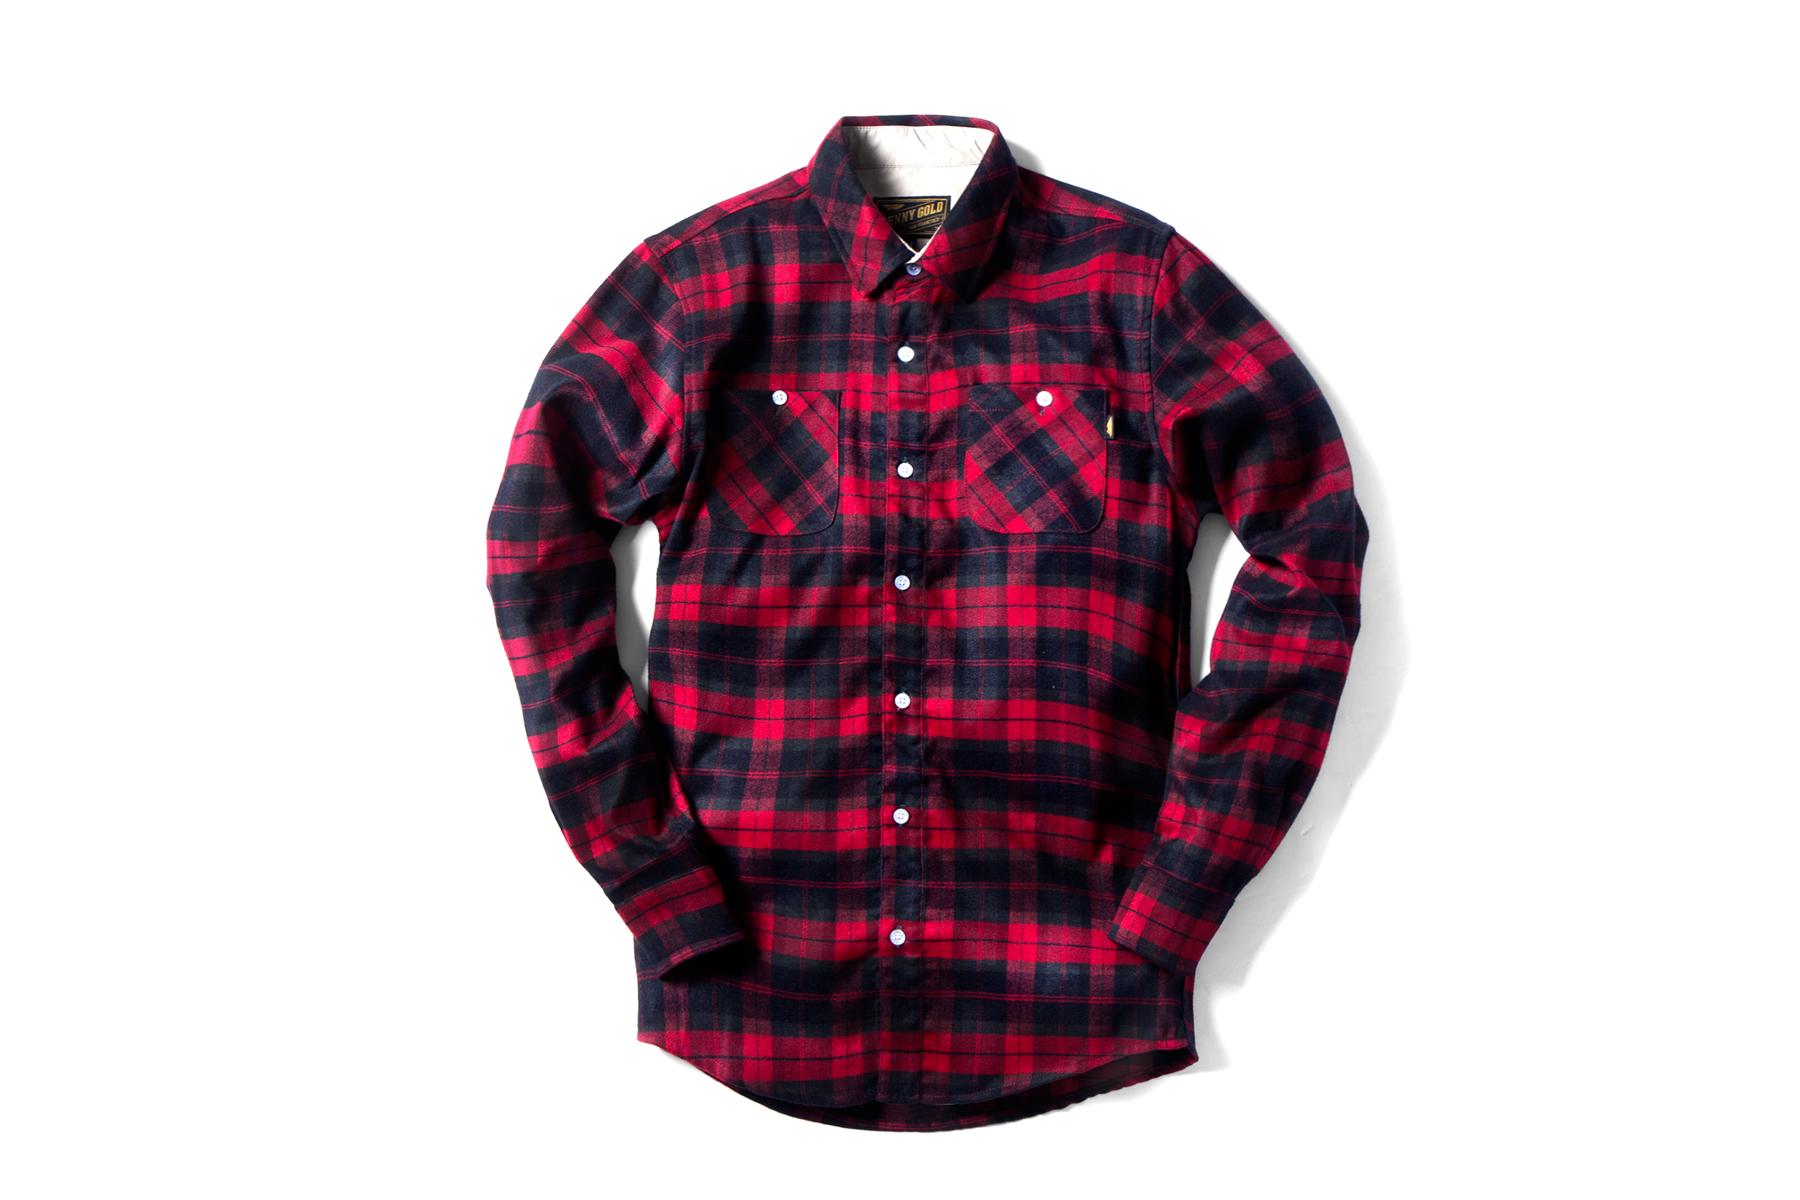 Benny Gold 2014 Fall/Winter Shirts